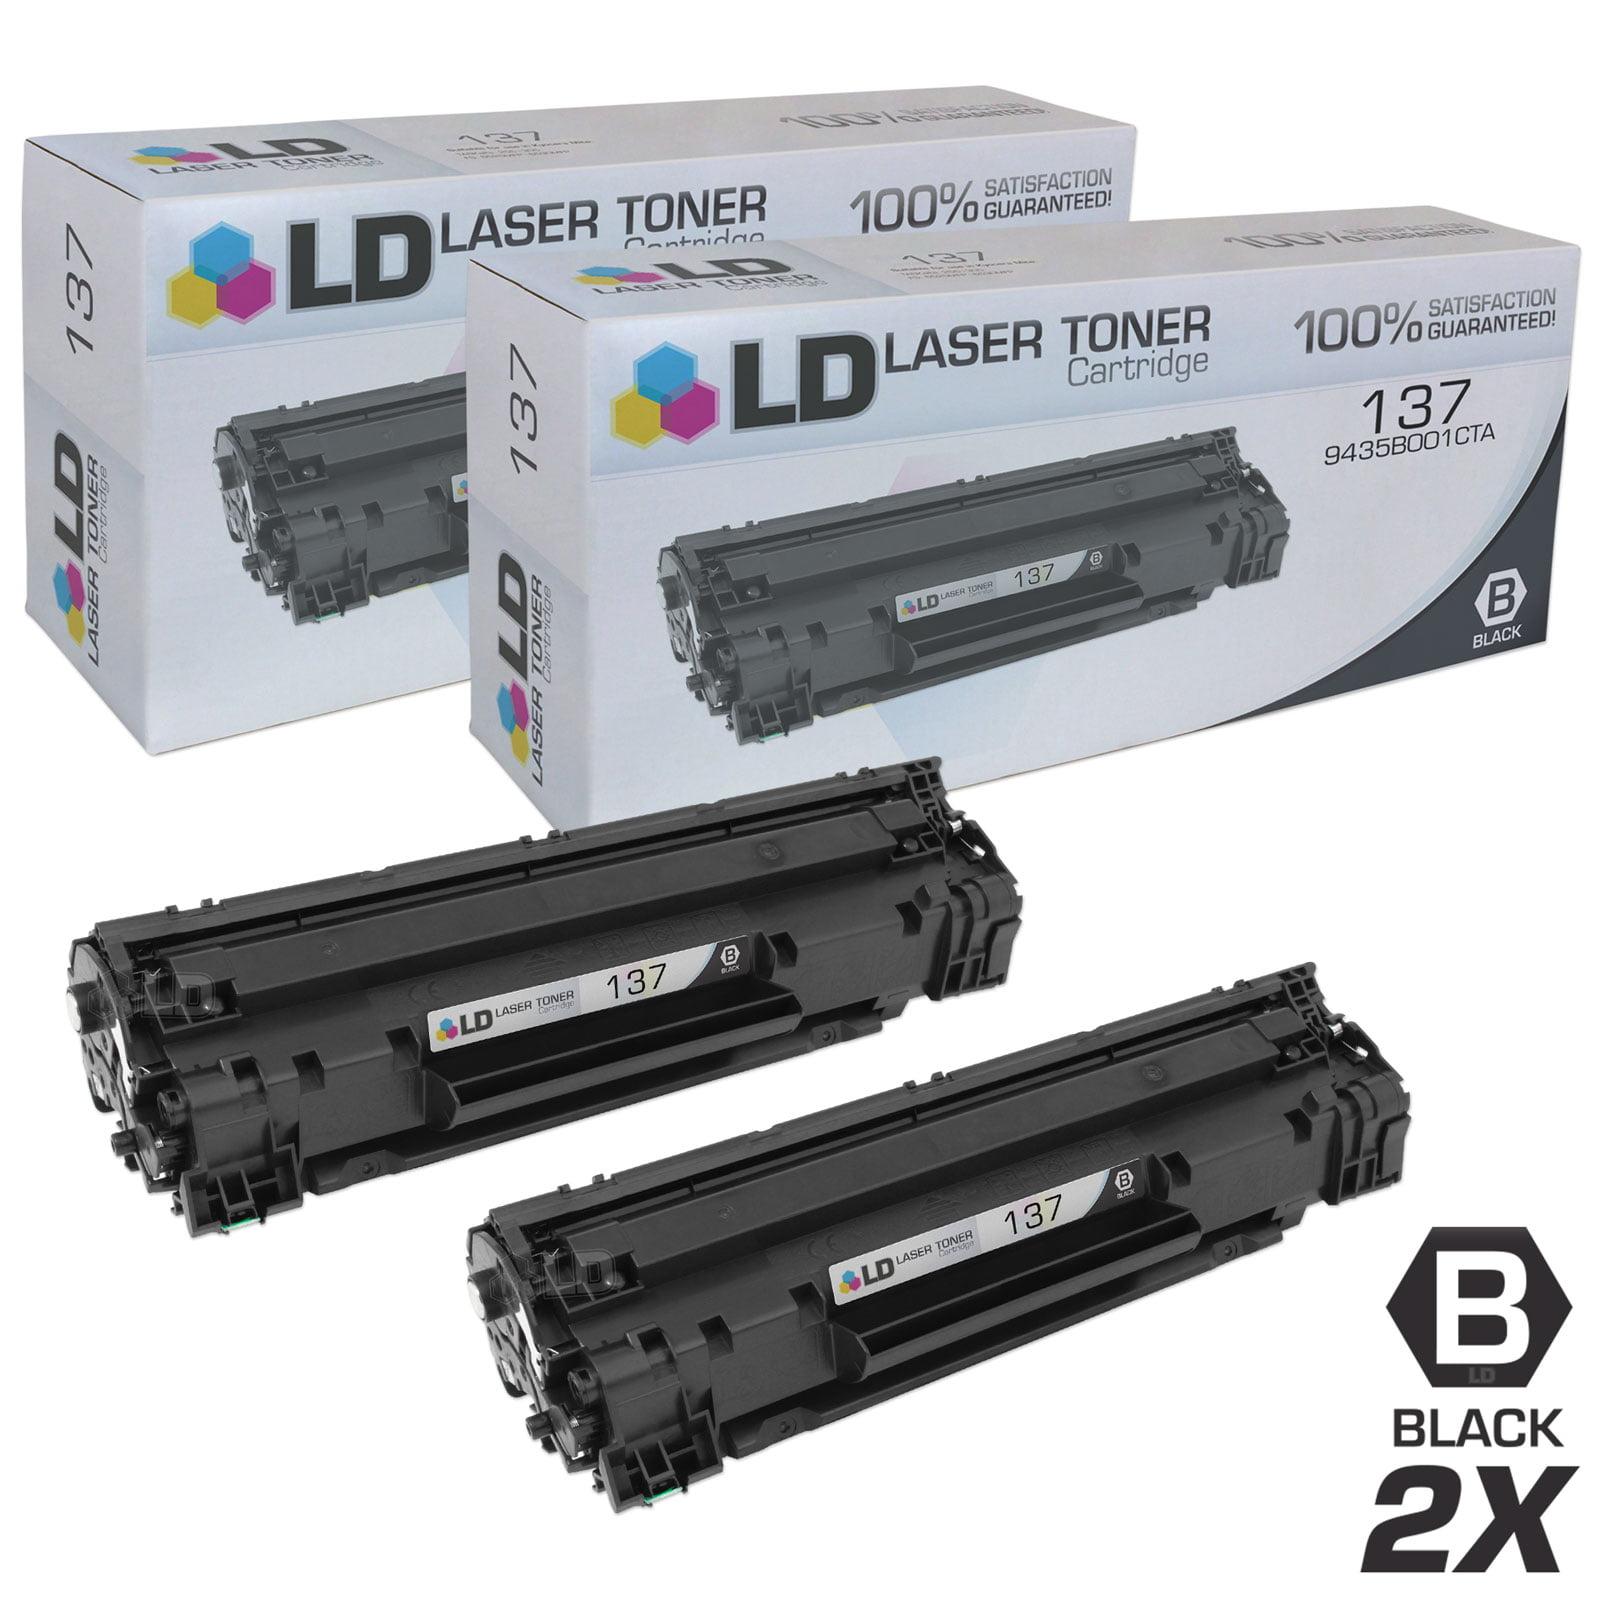 10 PK CRG137 Toner 9435B001 Black for Canon 137 ImageClass MF212w MF216n Printer